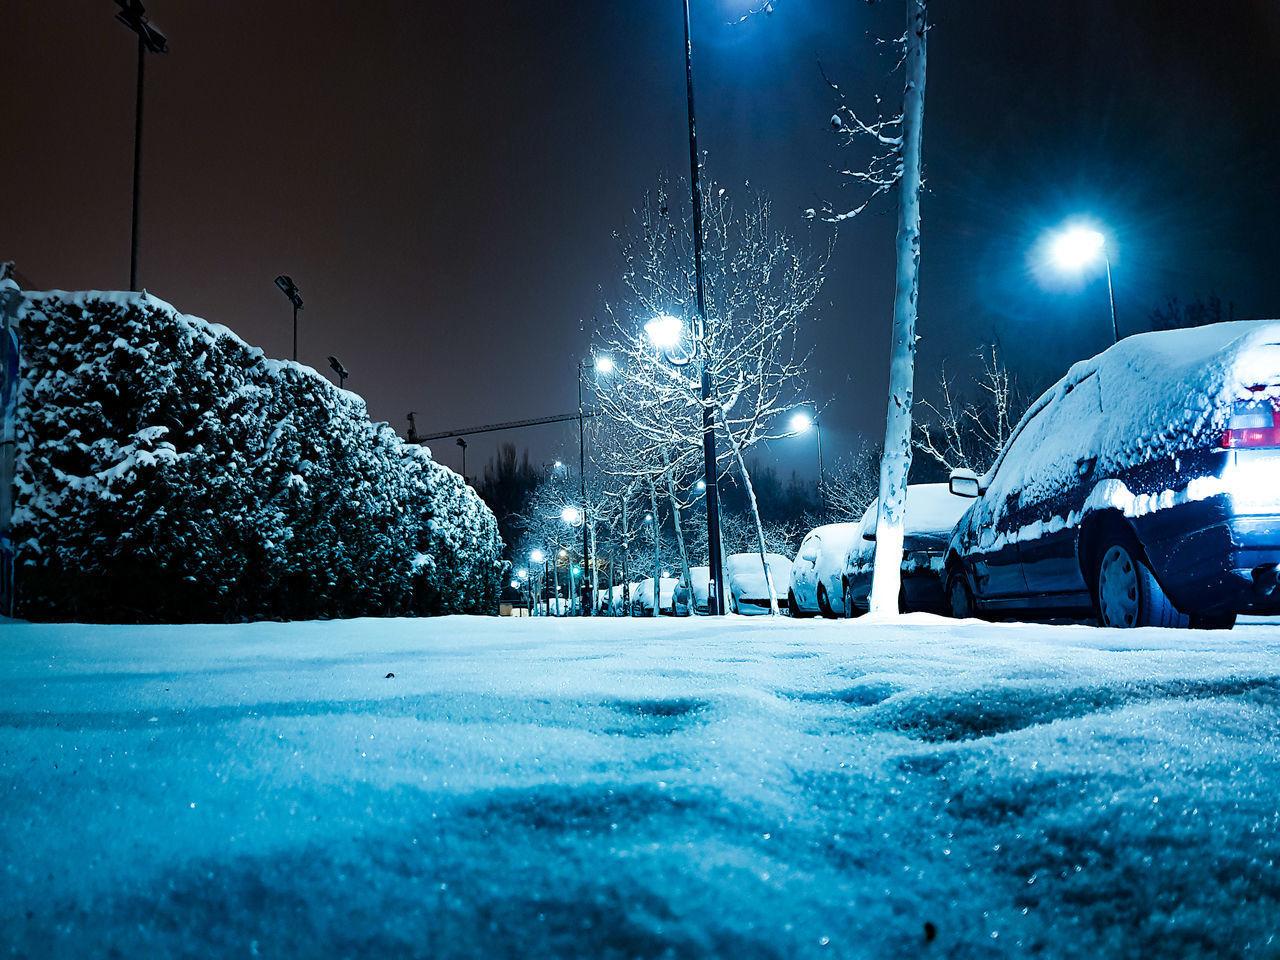 CARS ON ILLUMINATED ROAD IN WINTER AT NIGHT